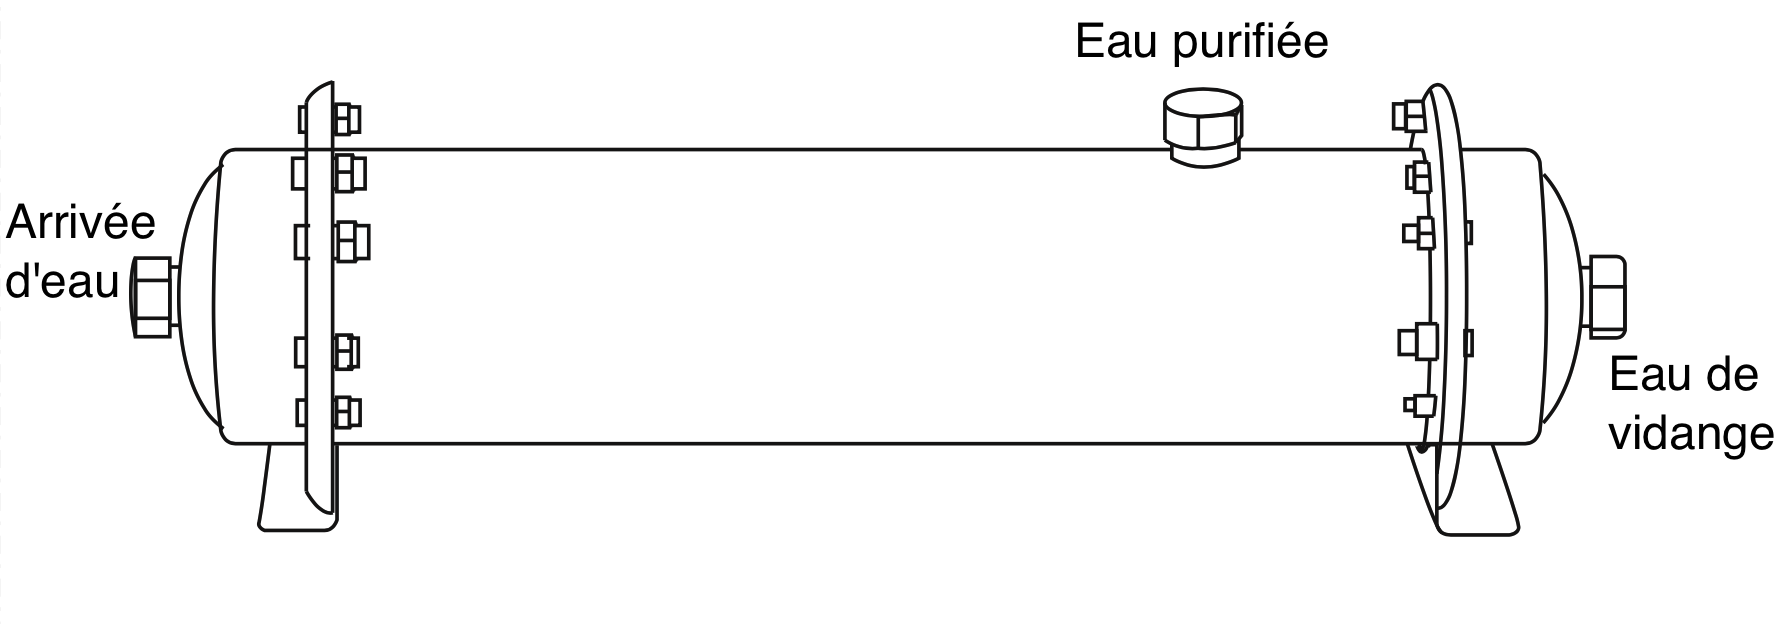 Schéma Ultra-Filtration.png